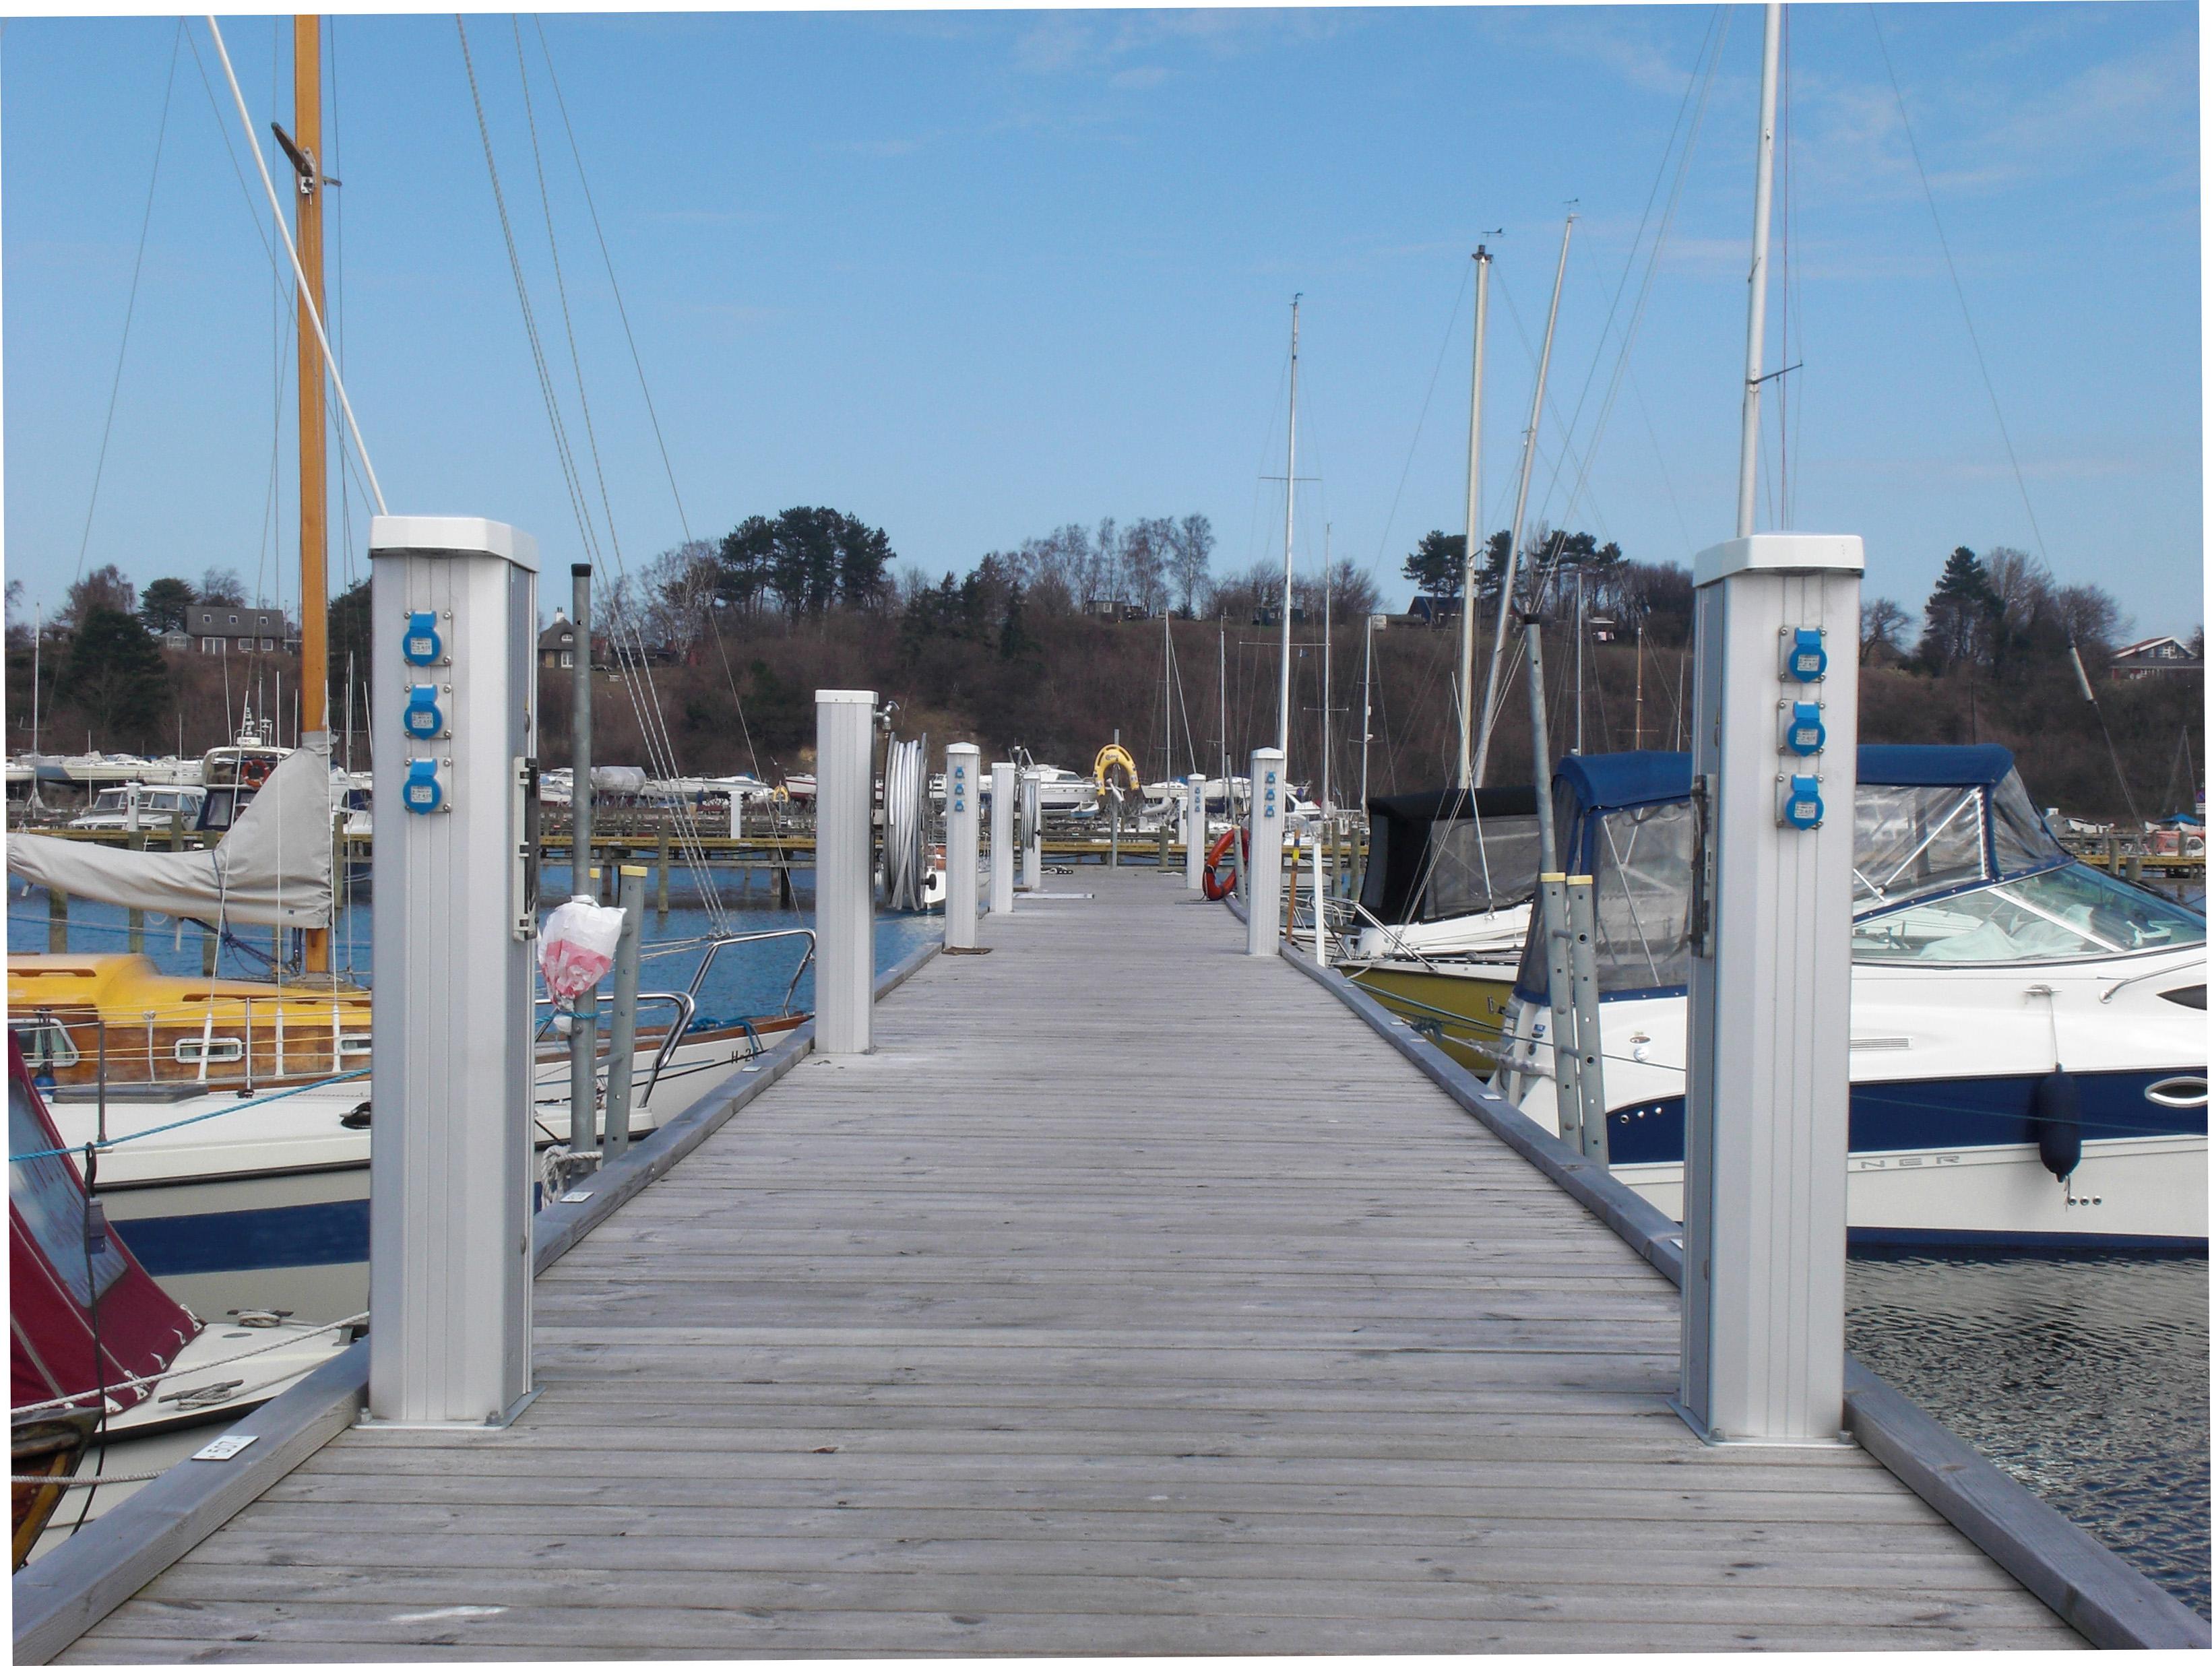 EnergyProof Seijsener energie jachthaven 09 Lynës